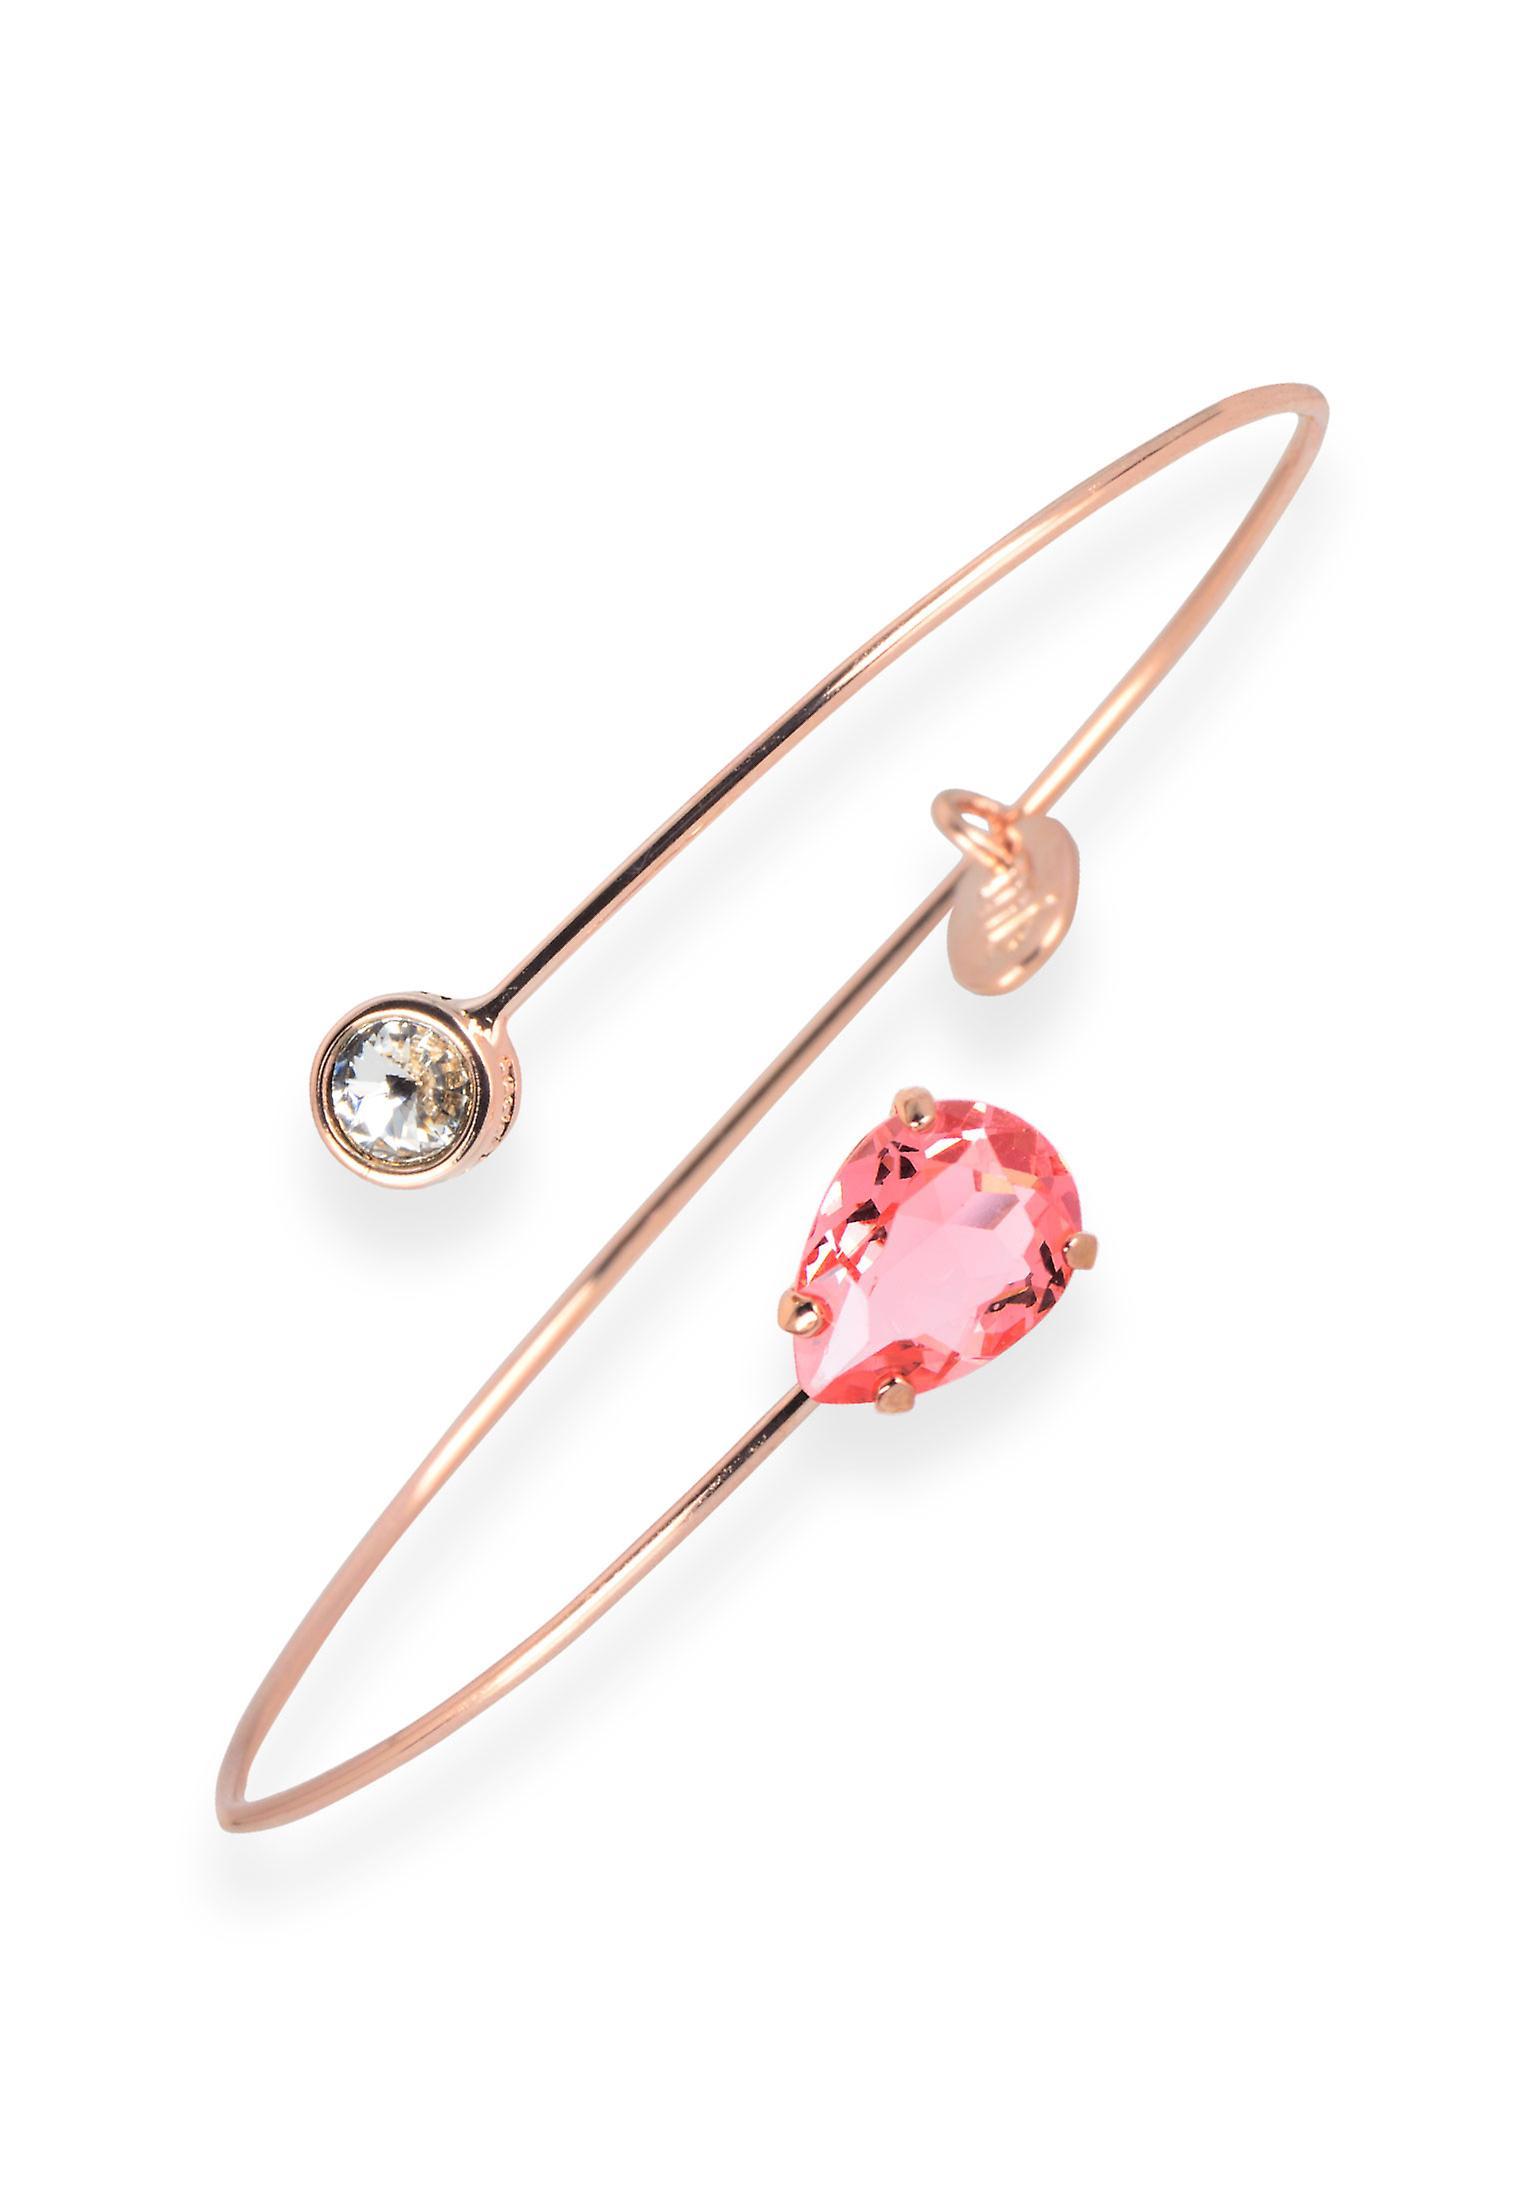 Pink bracelet with crystals from Swarovski 6224